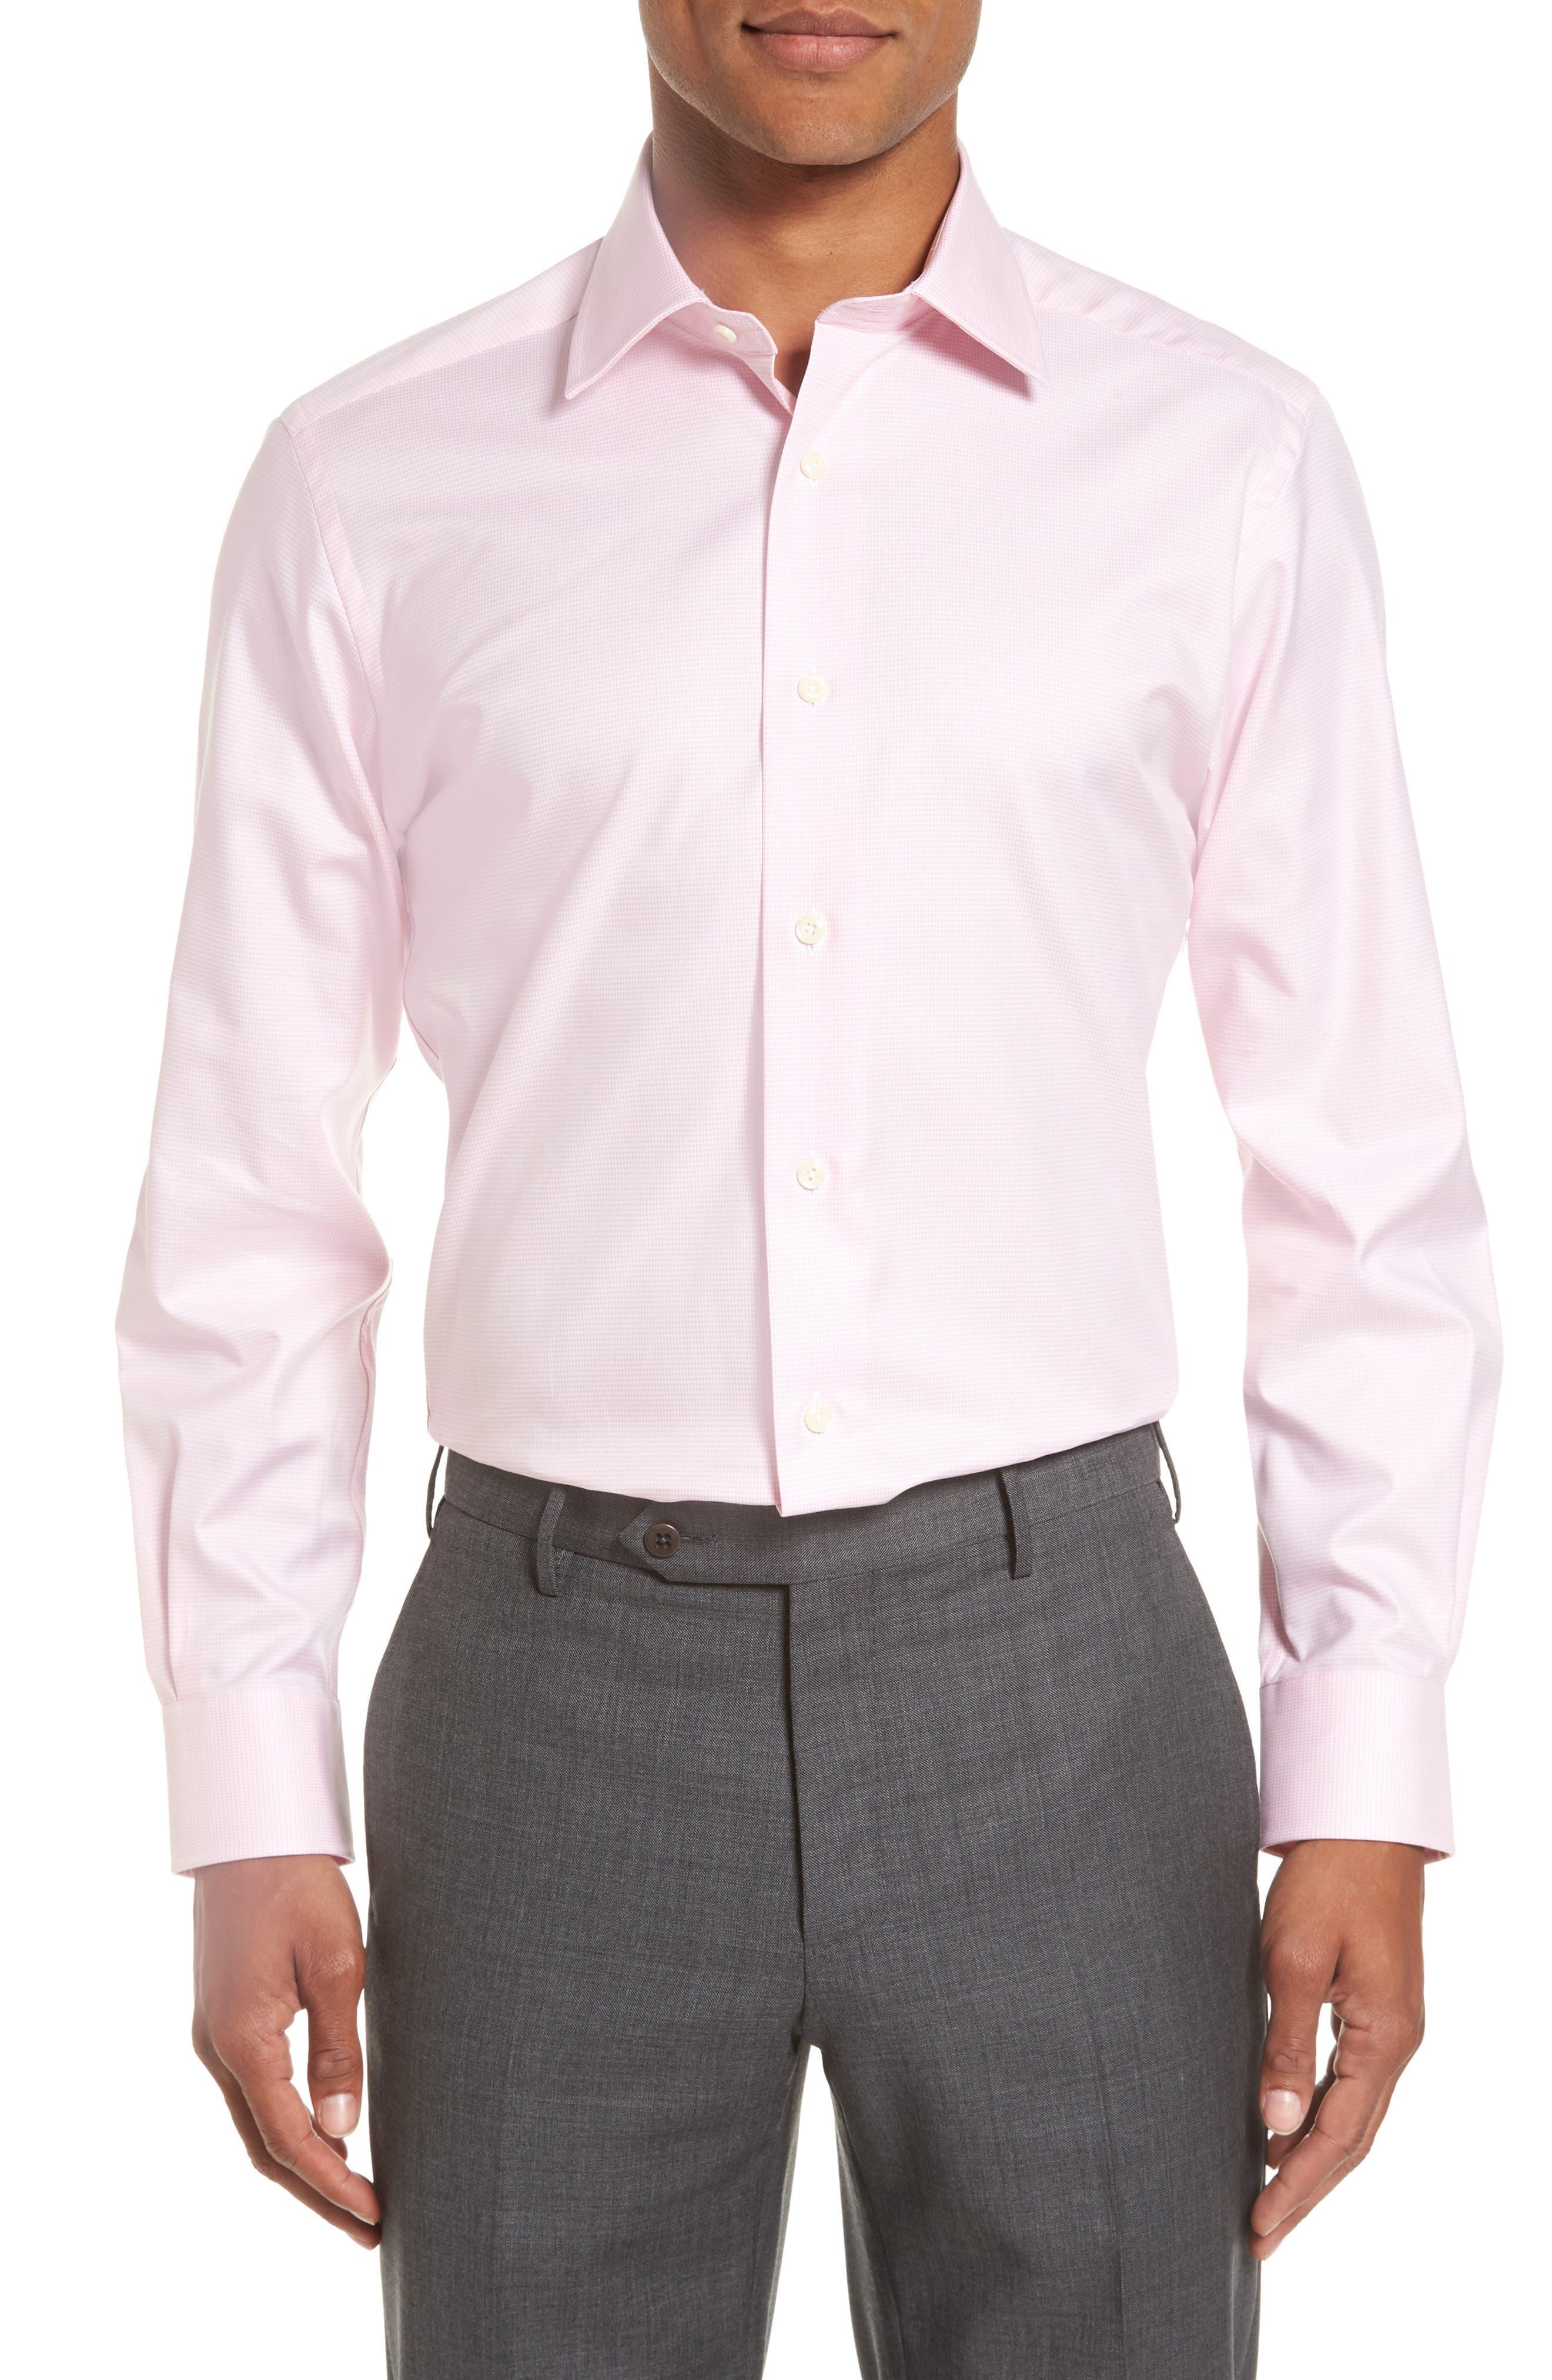 Alternate Image 1 Selected - David Donahue Trim Fit Houndstooth Dress Shirt